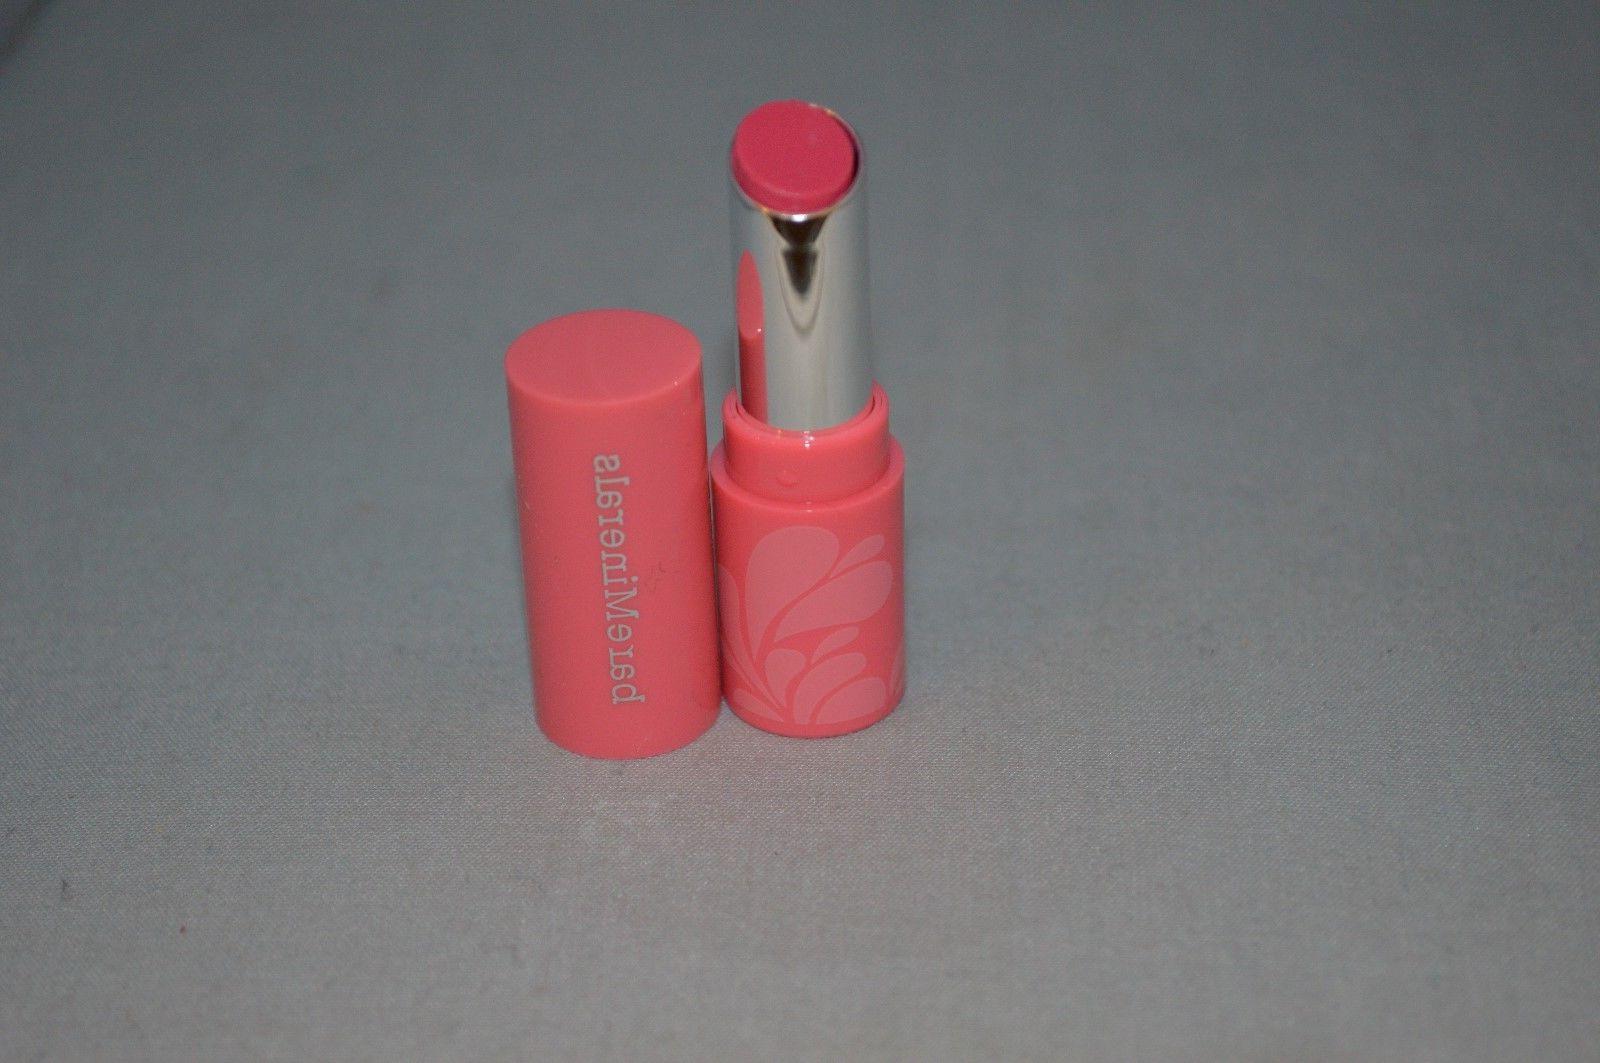 Bare Minerals Pop Of Passion Lip Balm Pink Passion .03oz New